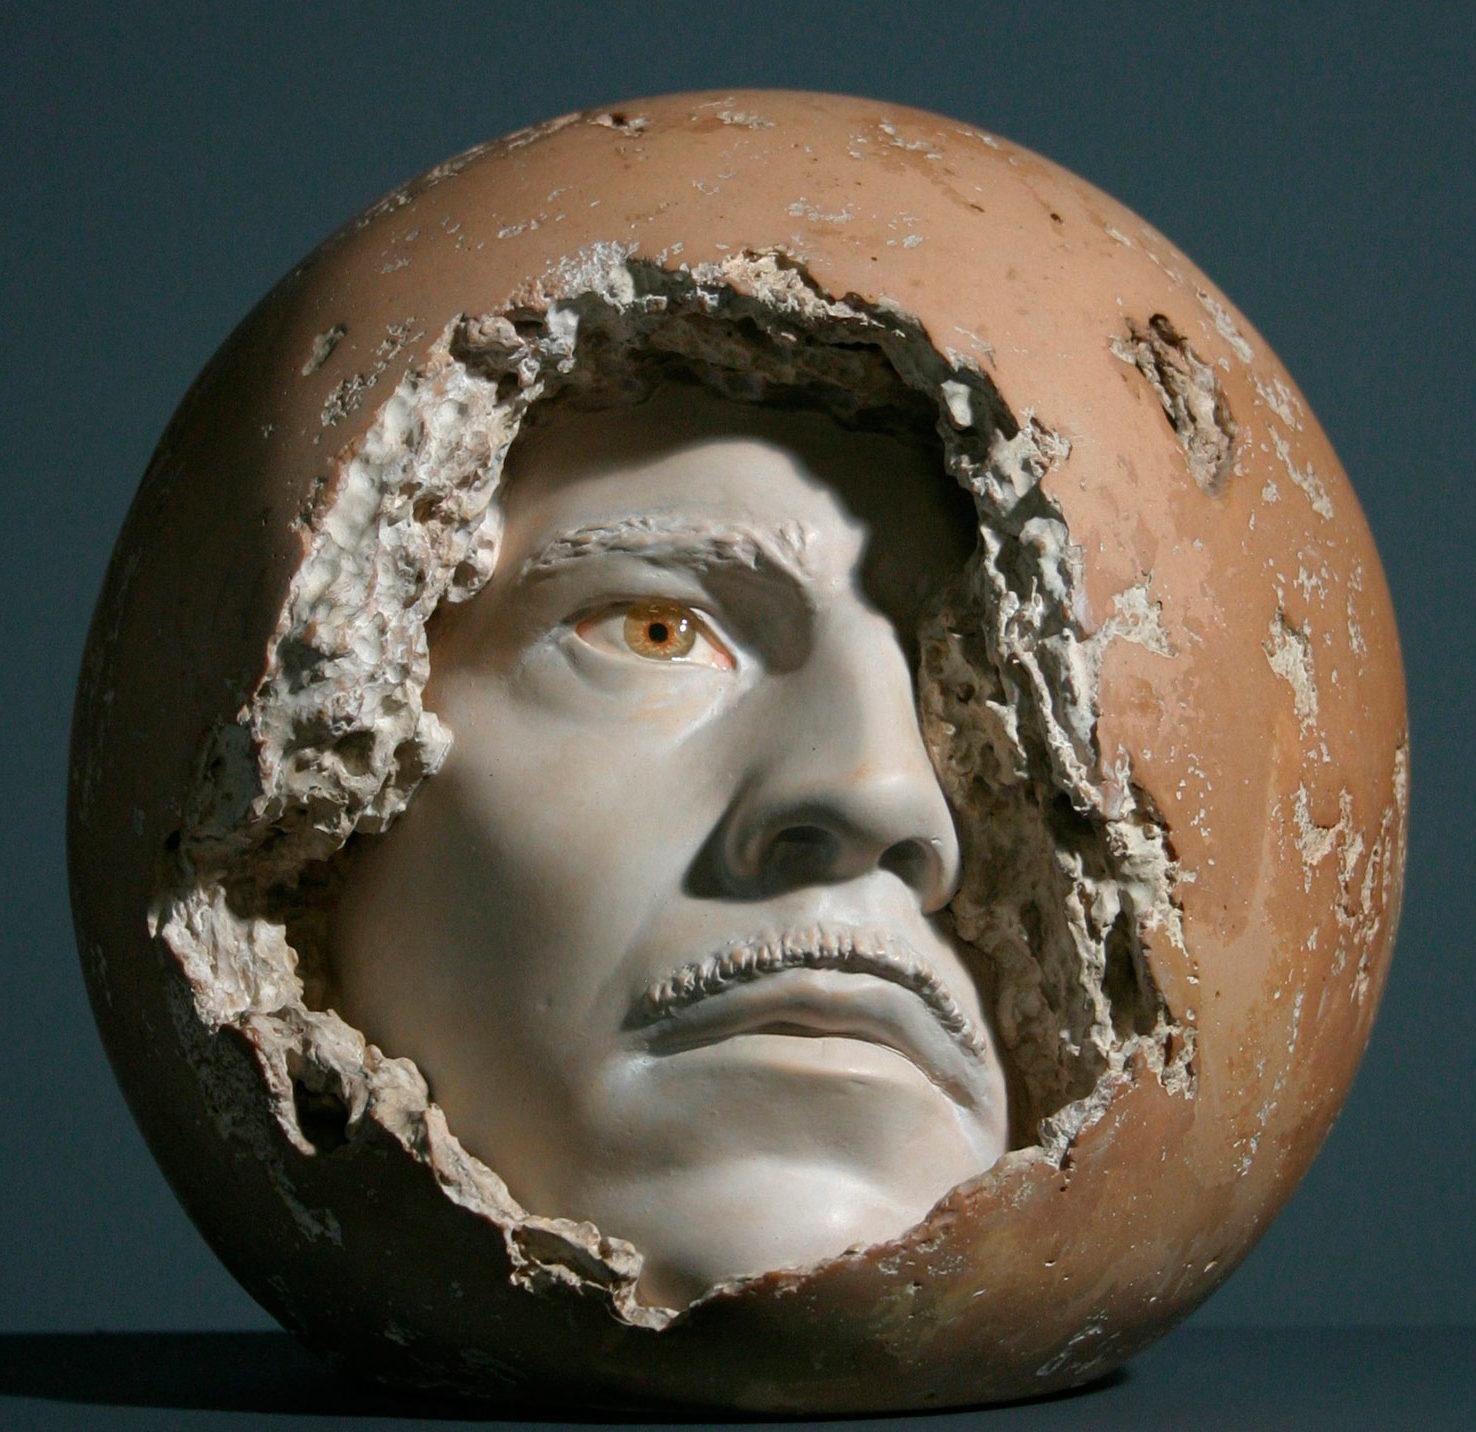 Arthur Kern: Self-Portrait, 10 inches in diameter, 1969